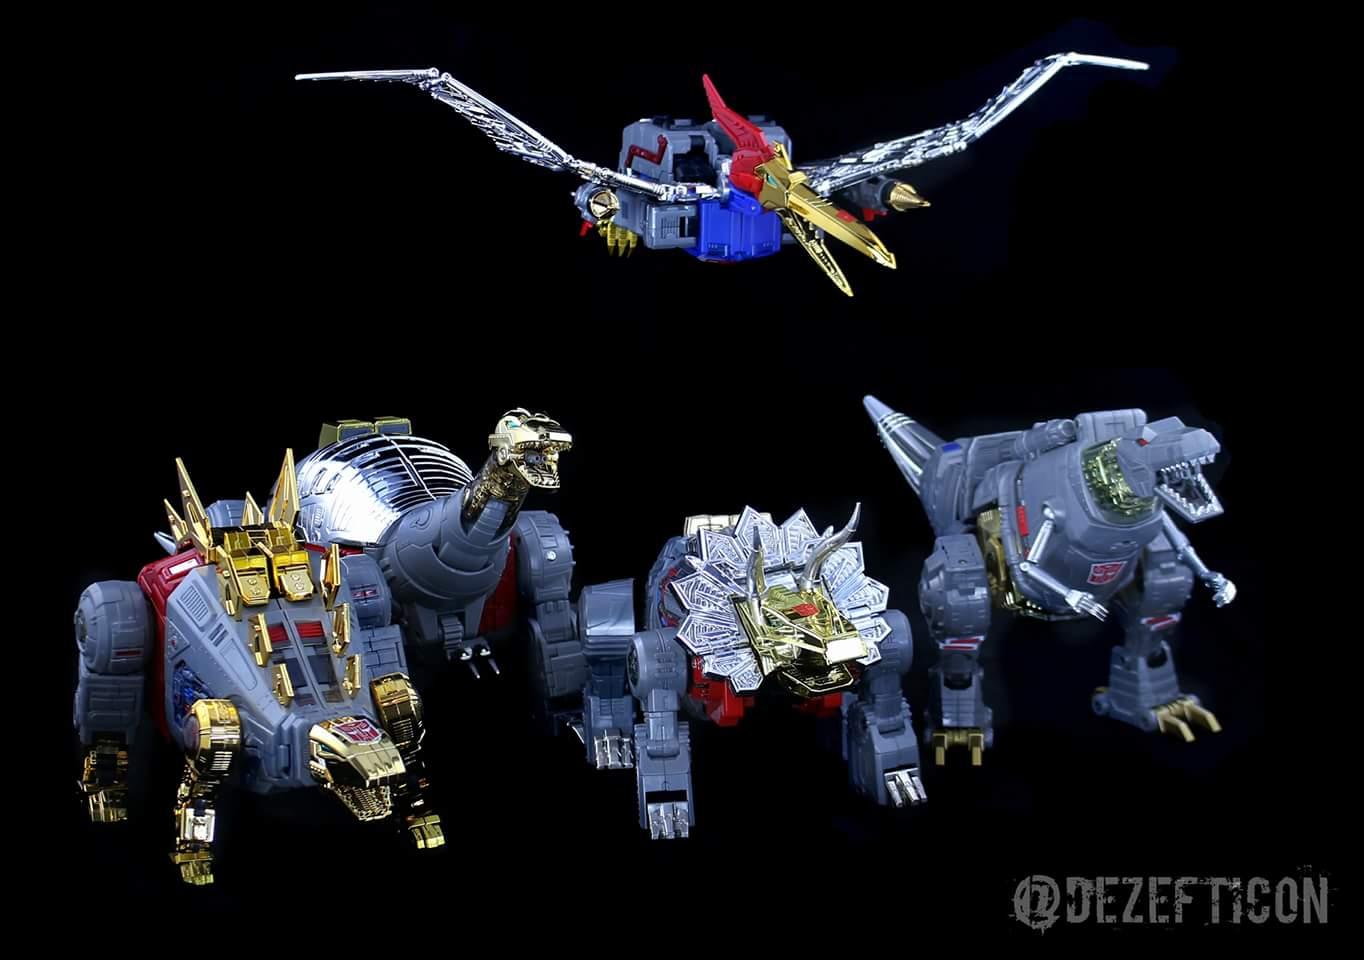 [Fanstoys] Produit Tiers - Dinobots - FT-04 Scoria, FT-05 Soar, FT-06 Sever, FT-07 Stomp, FT-08 Grinder - Page 9 HiMejZty